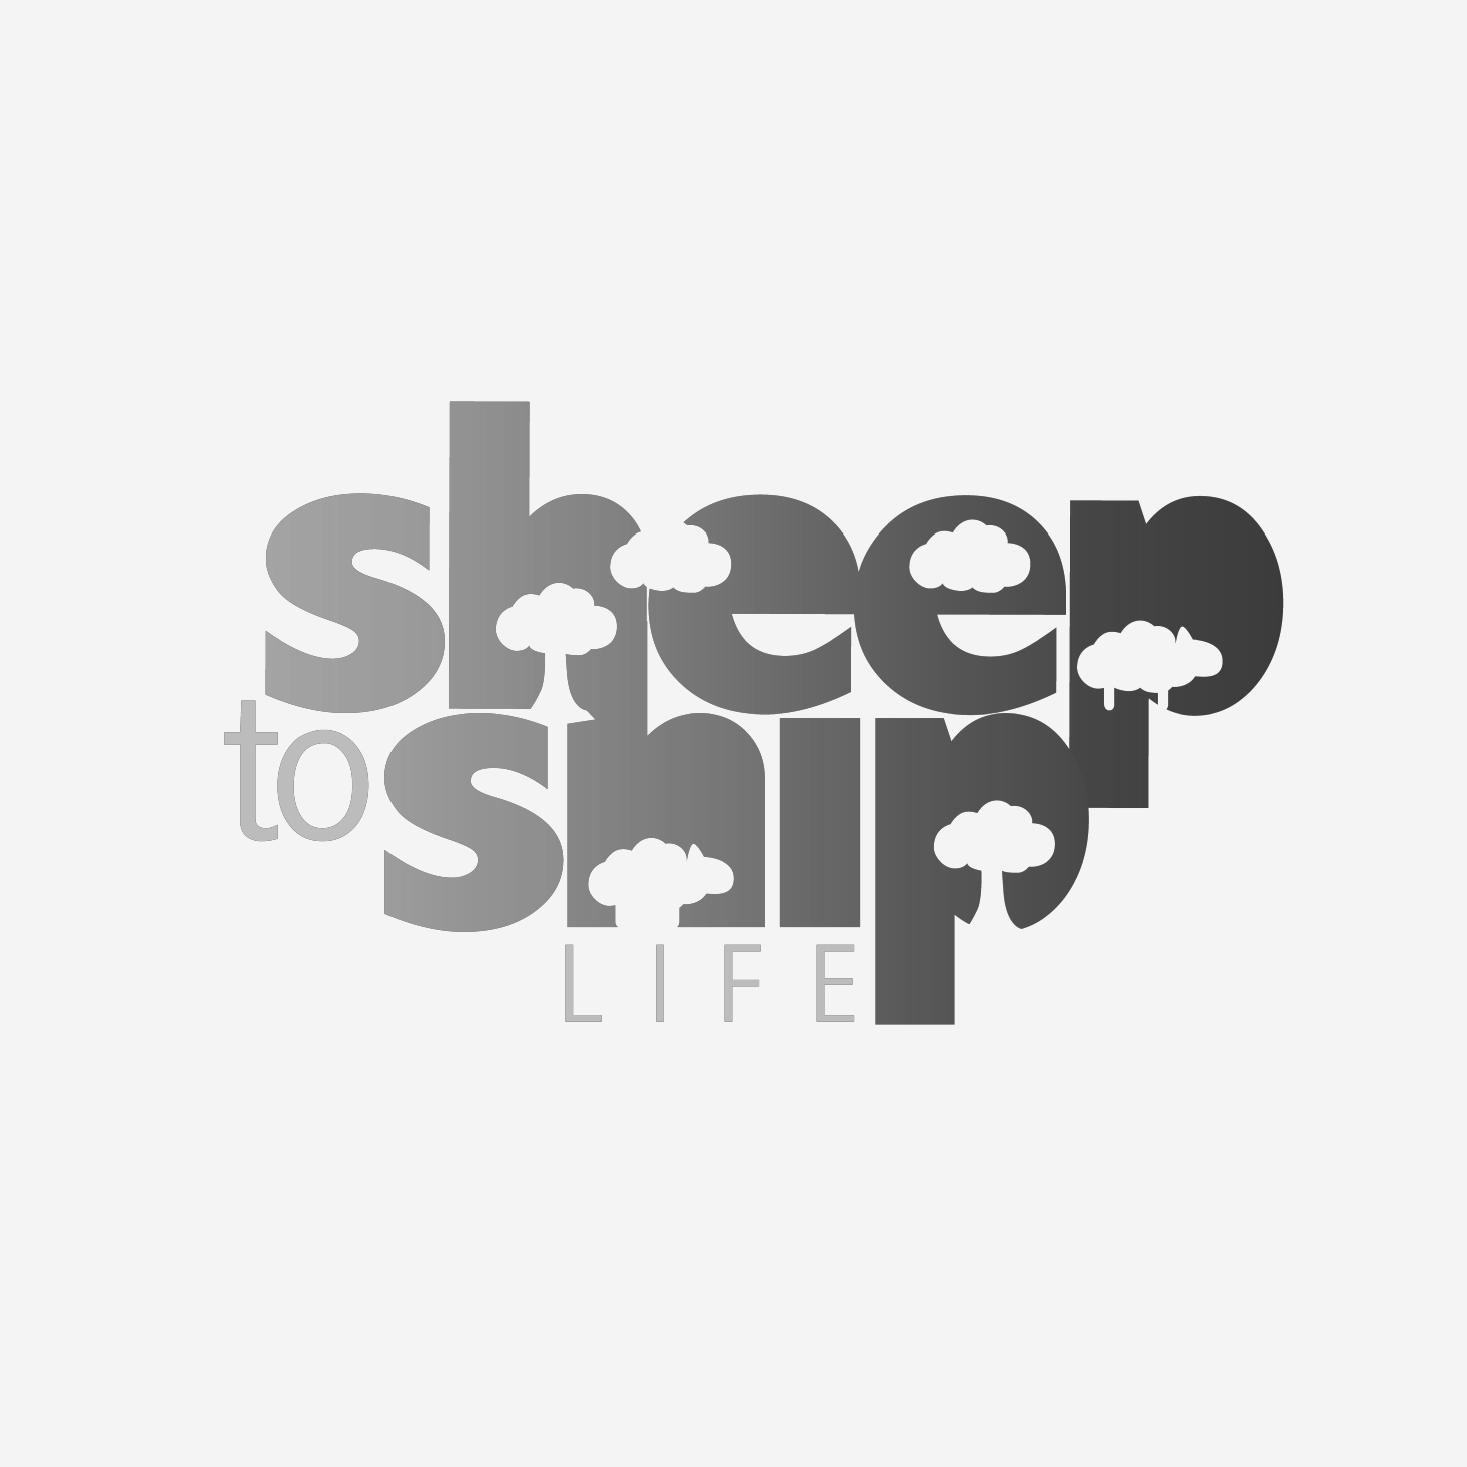 SheepToShip LIFE